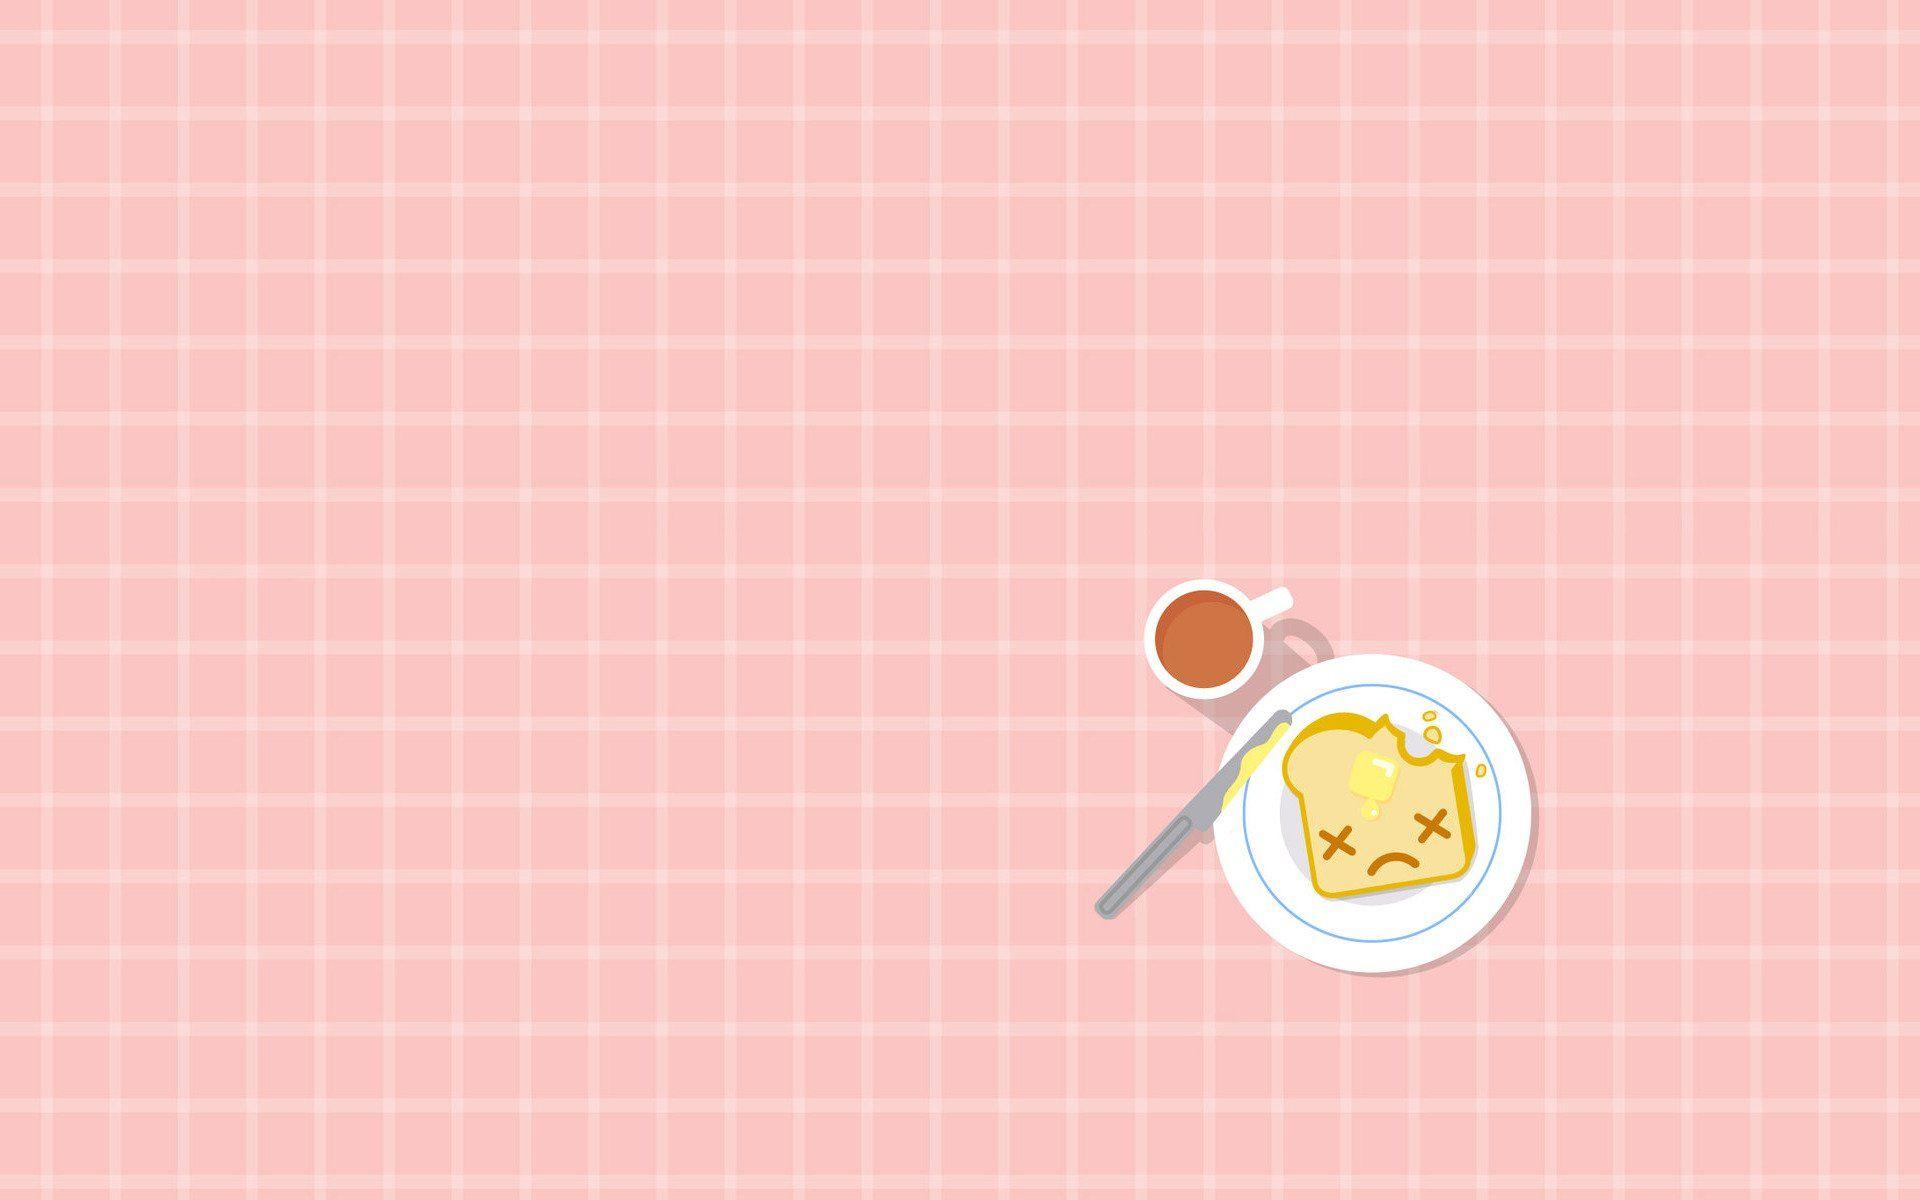 Cute Adorable Fun (Junk) Food Wallpaper Cute food